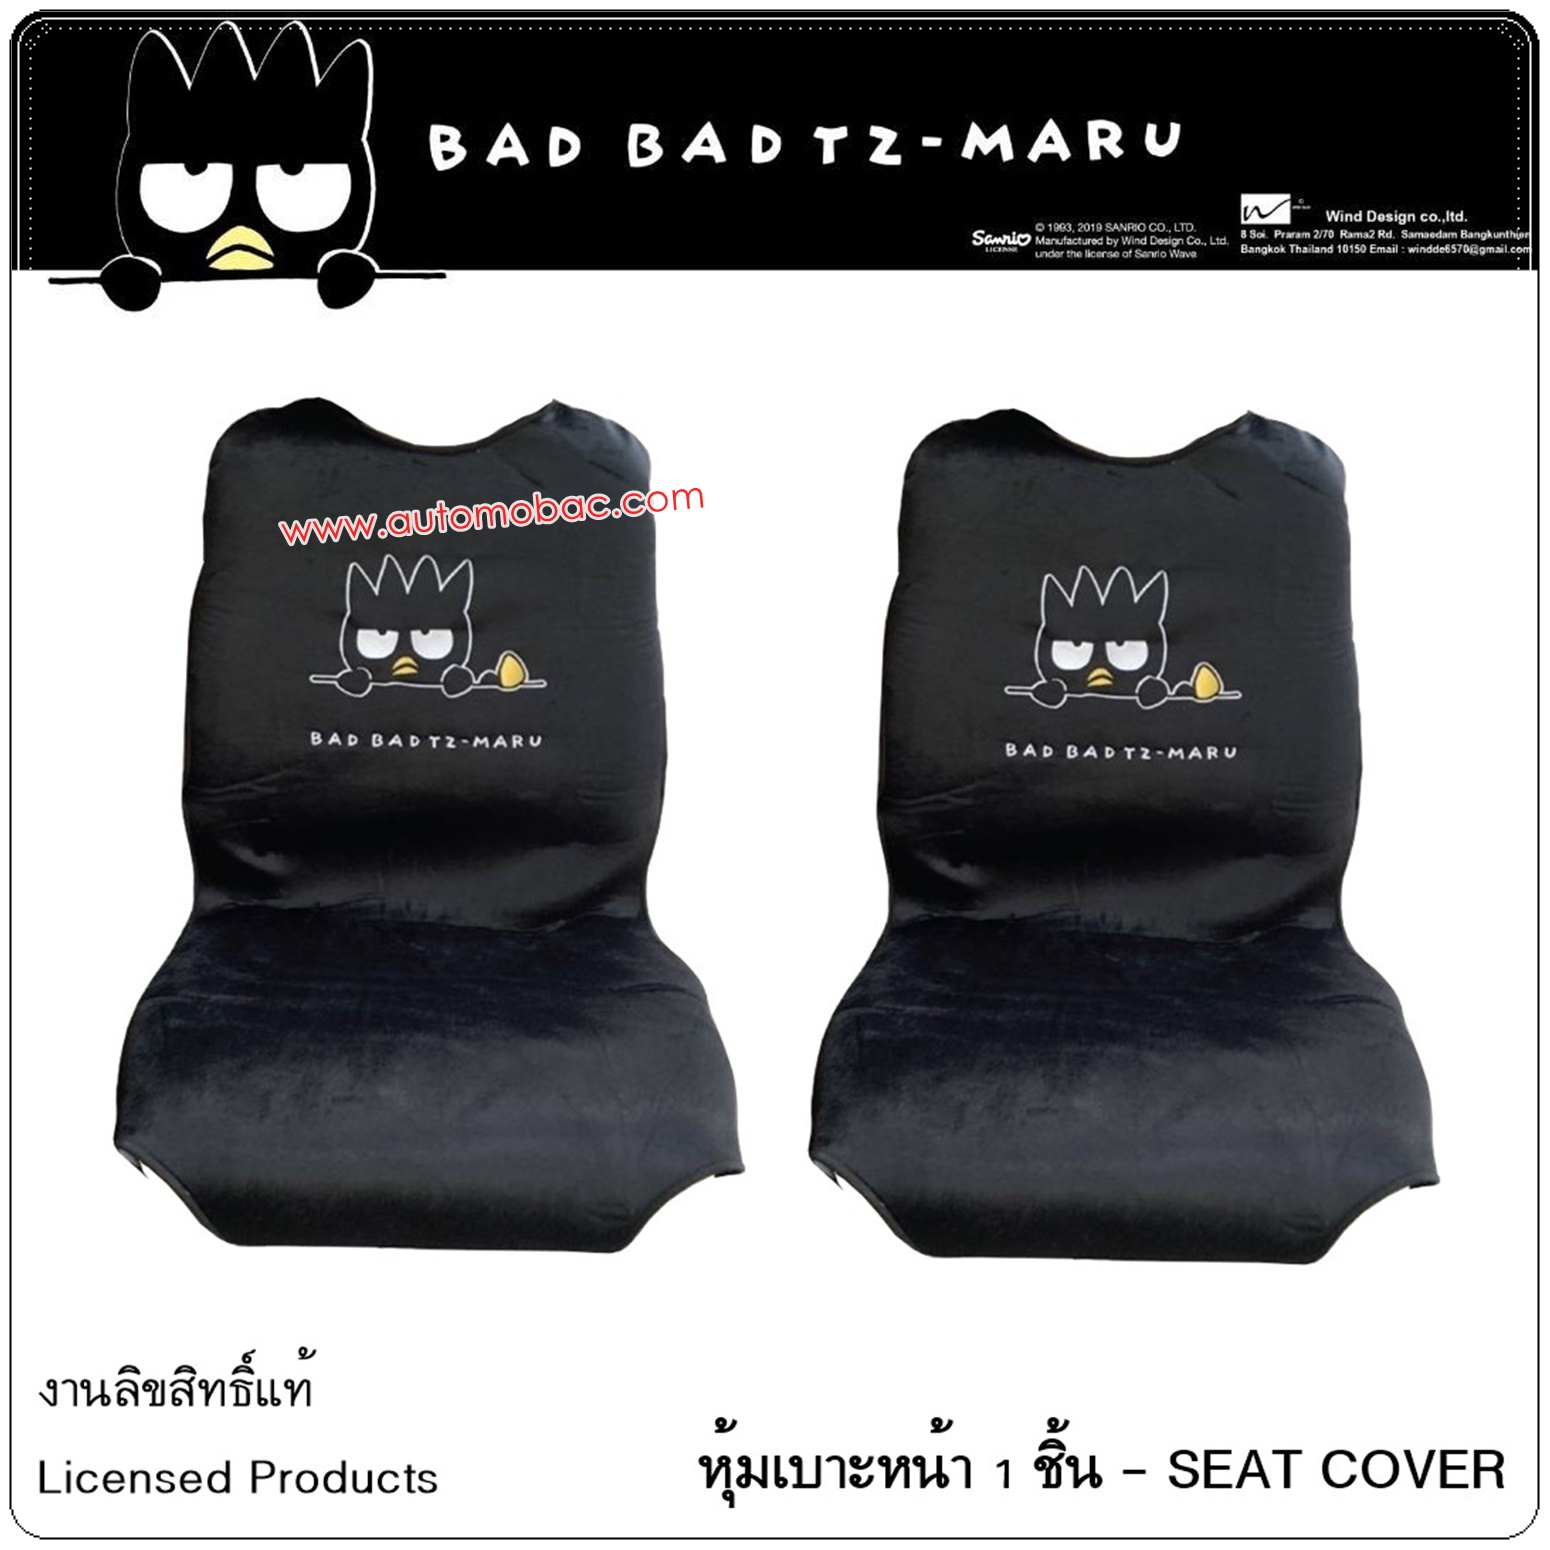 Bad Badtz-Maru BLACK แบดมารุ สีดำ ผ้าหุ้มเบาะเต็มตัว 2 ชิ้น ลิขสิทธิ์แท้ ป้องกันสิ่งสกปรก สวยงาม